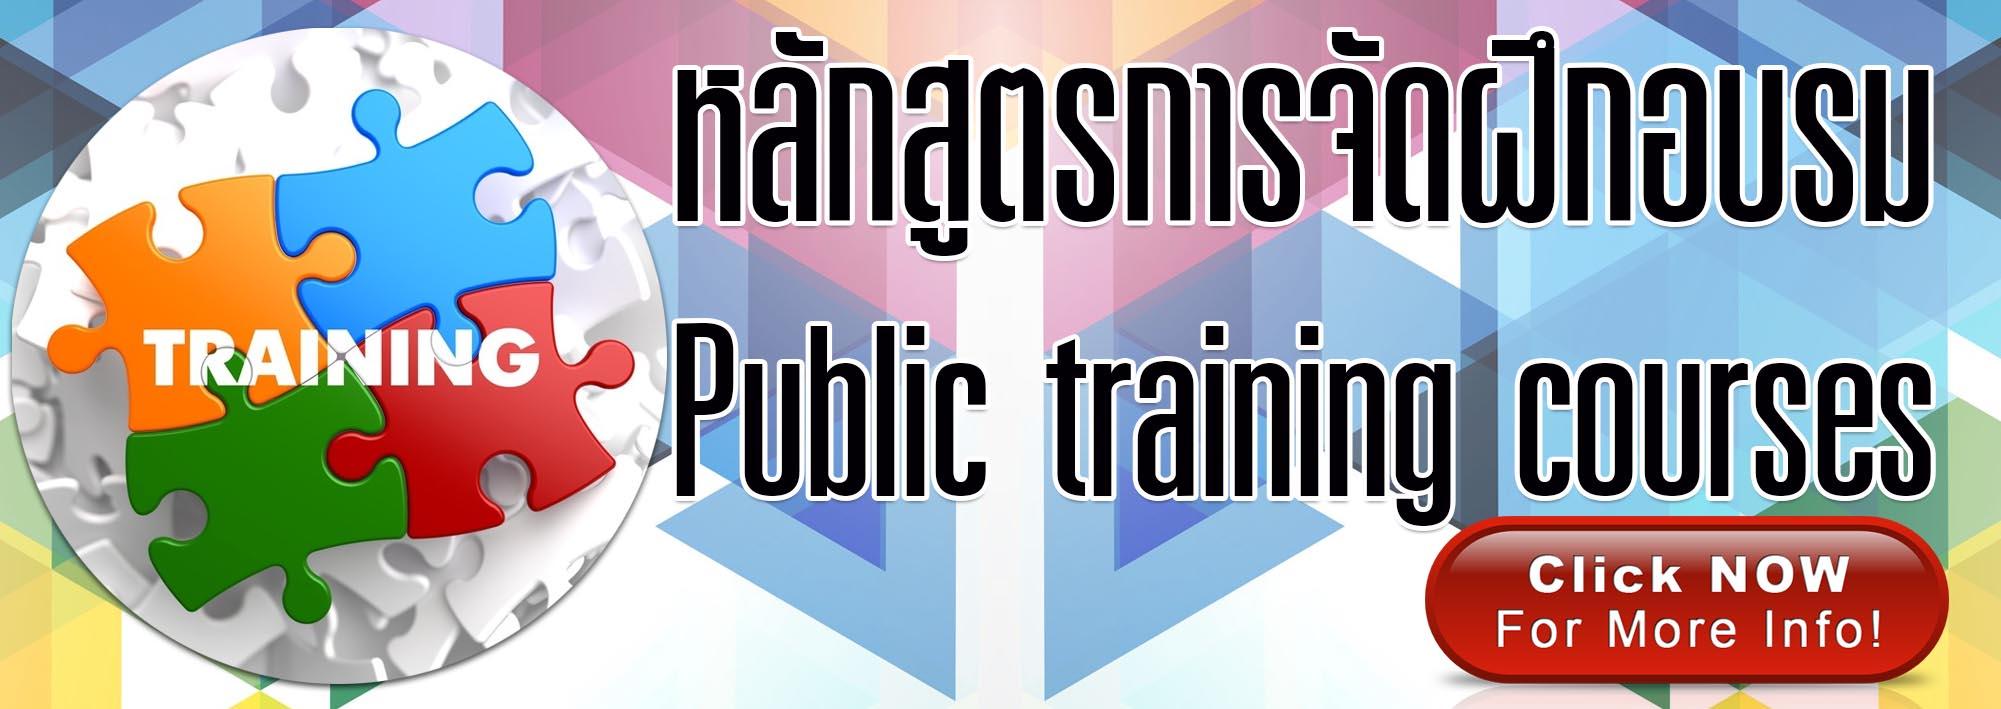 Public_training_course